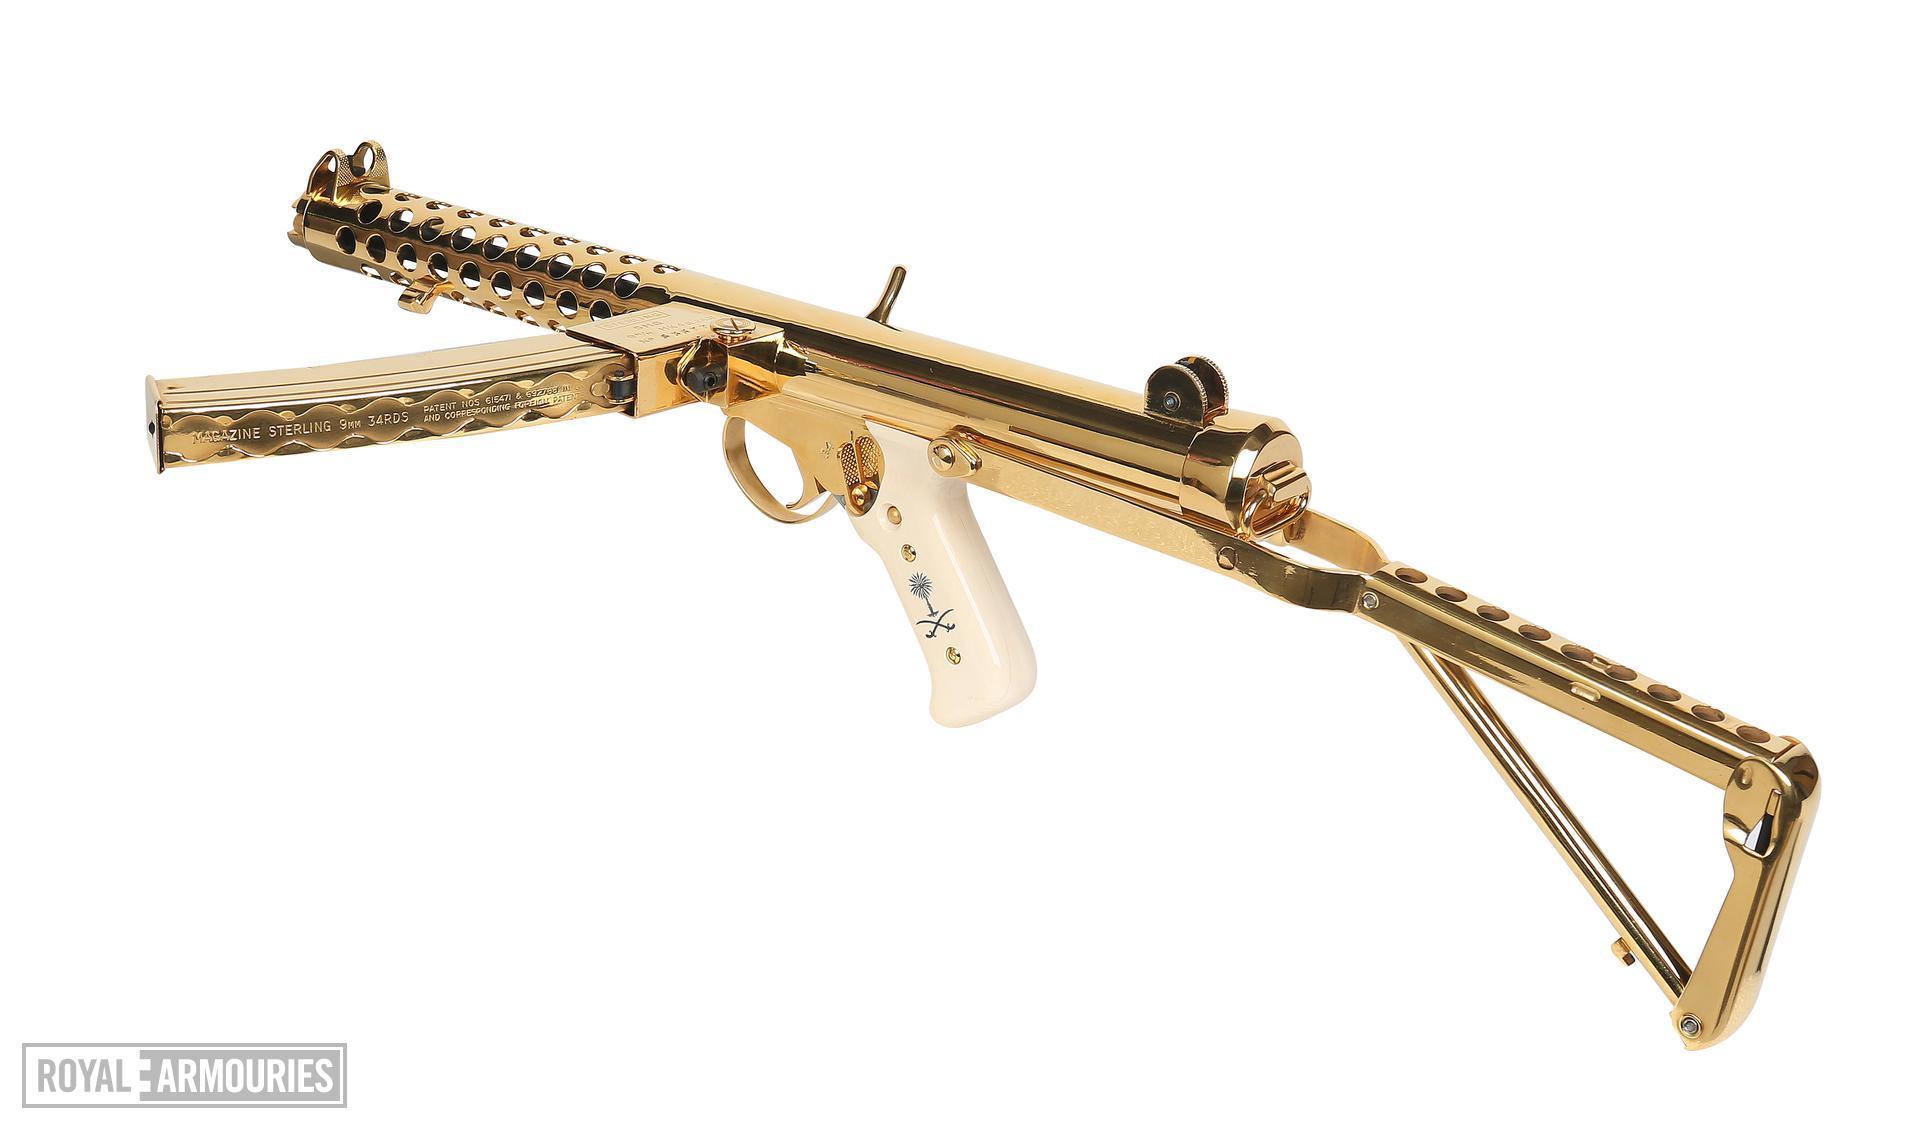 Centrefire automatic submachine gun - Sterling Mk.4 (L2A3)